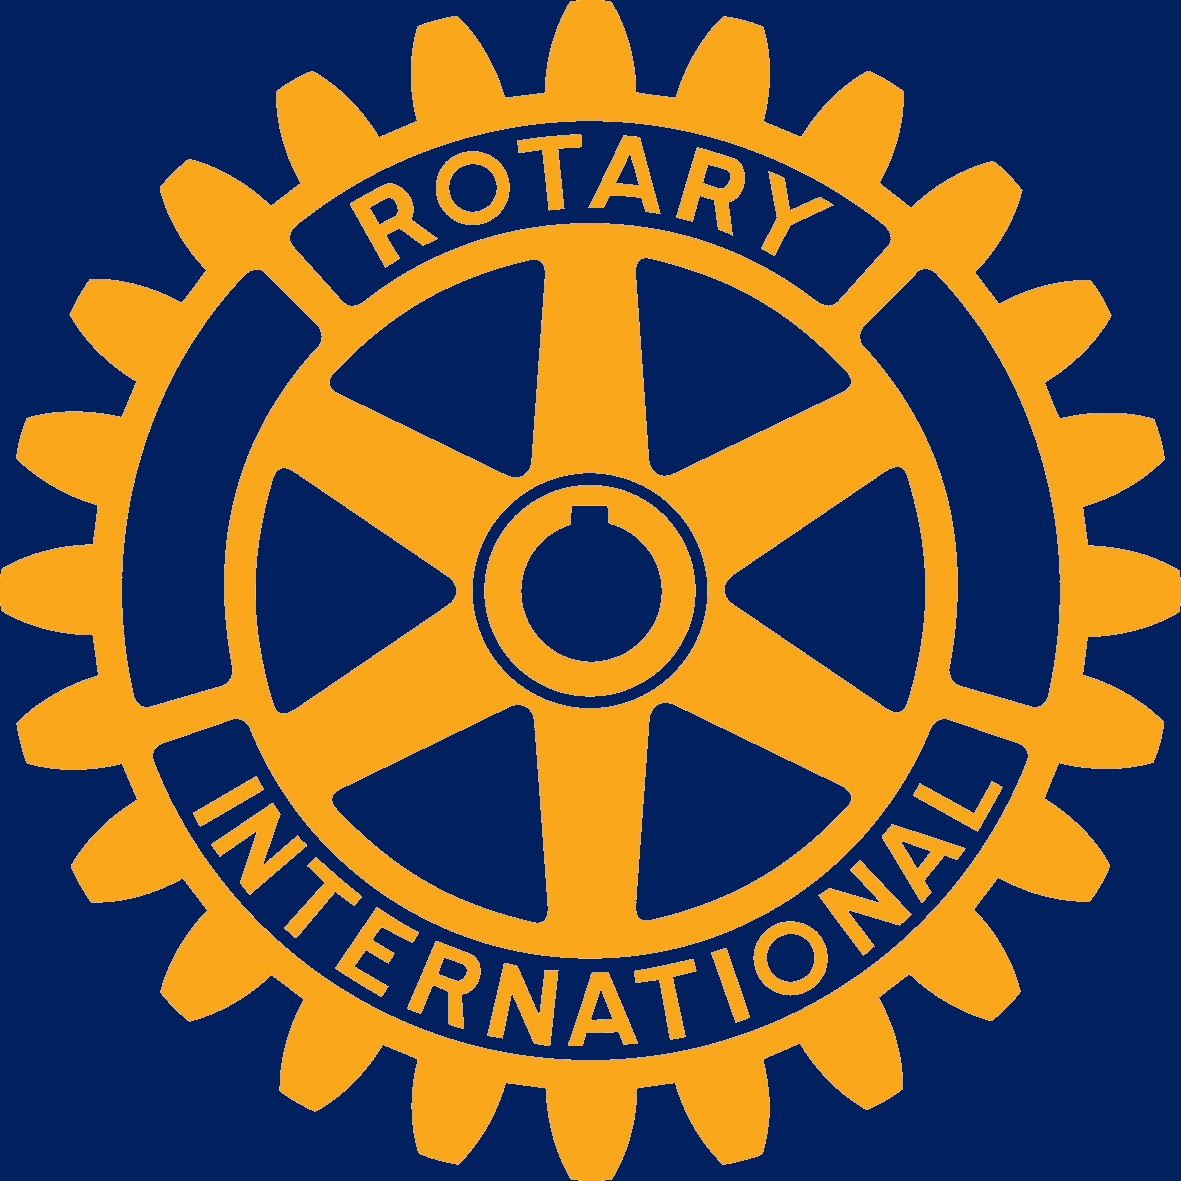 Marvelous Rotary International Logo 27 For Your Luxury Car Logos